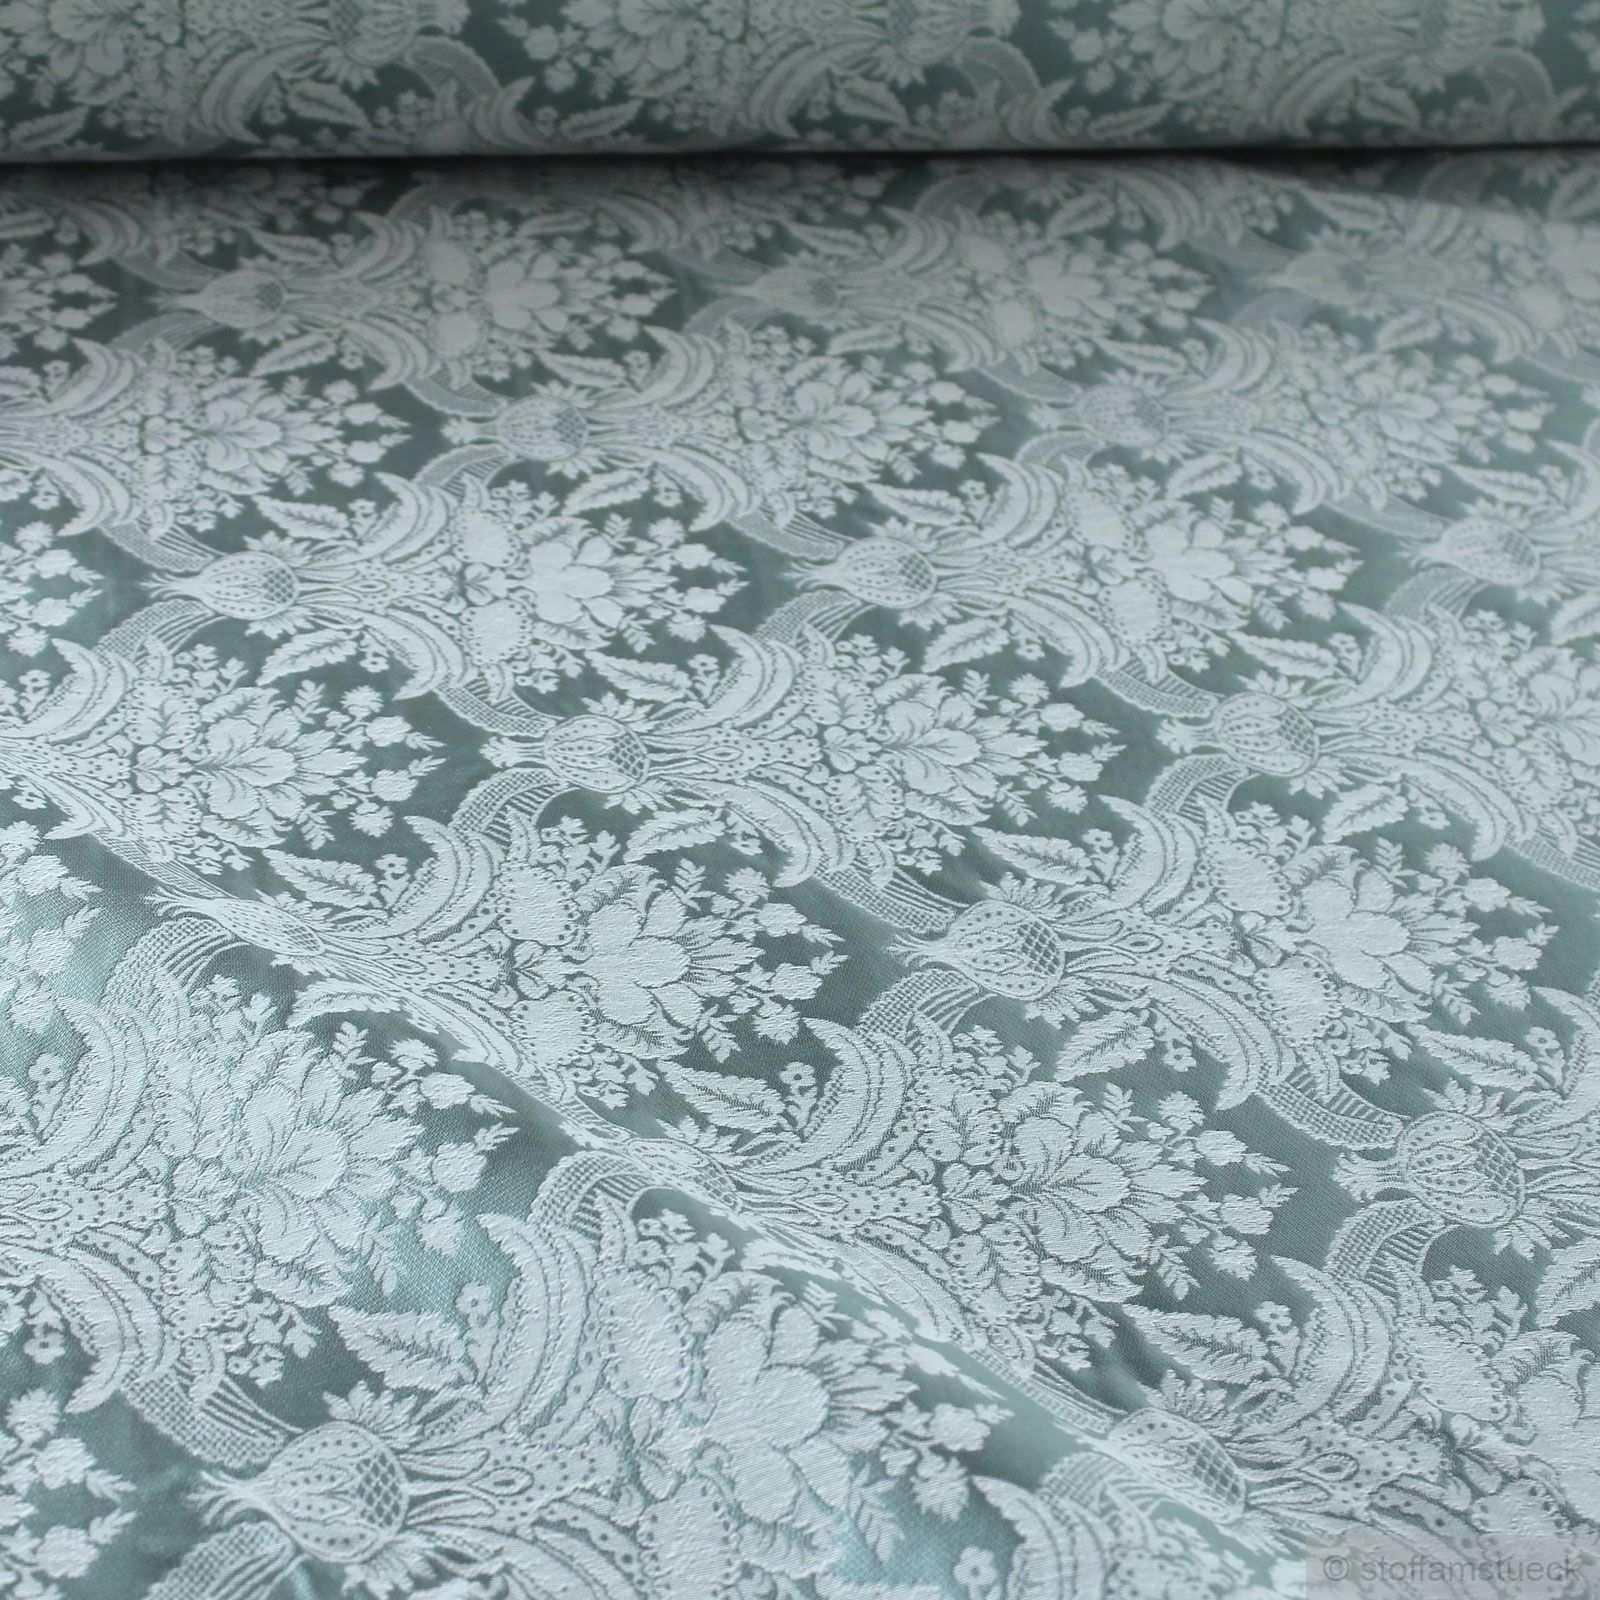 Polyester Baumwolle Jacquard Ornament Turkis Ecru Breit Stoff Am Stuck Ornamente Stoff Am Stuck Dekoration